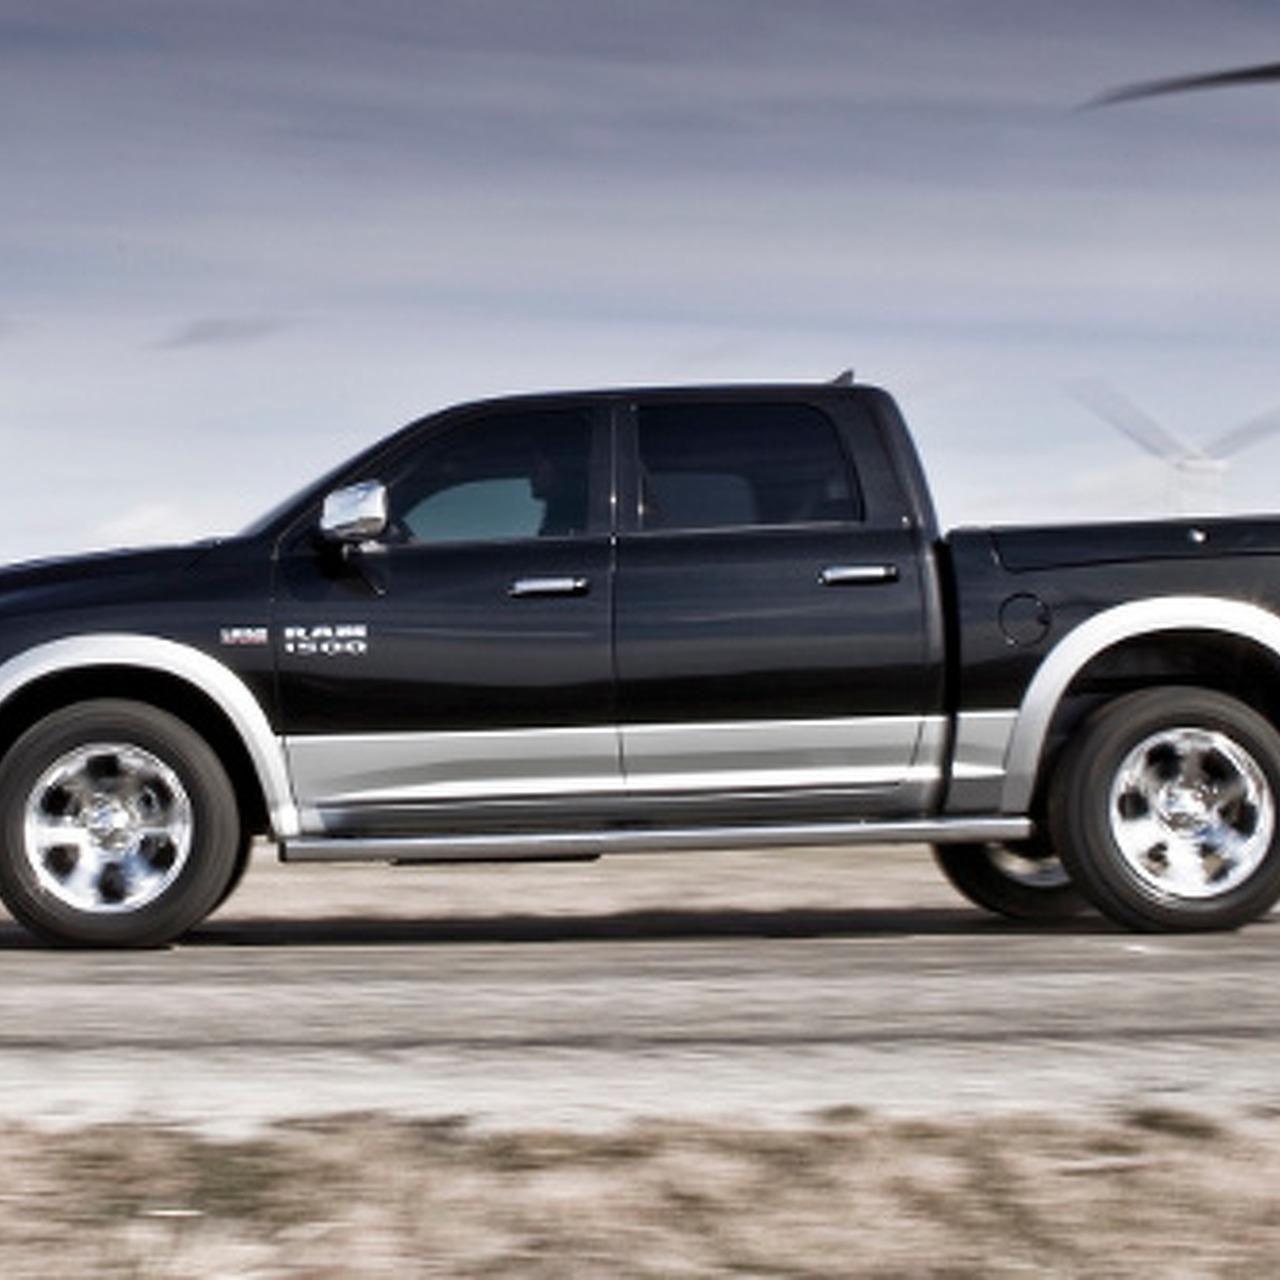 Cadillac ATS, Ram 1500 Named Car, Truck of the Year!